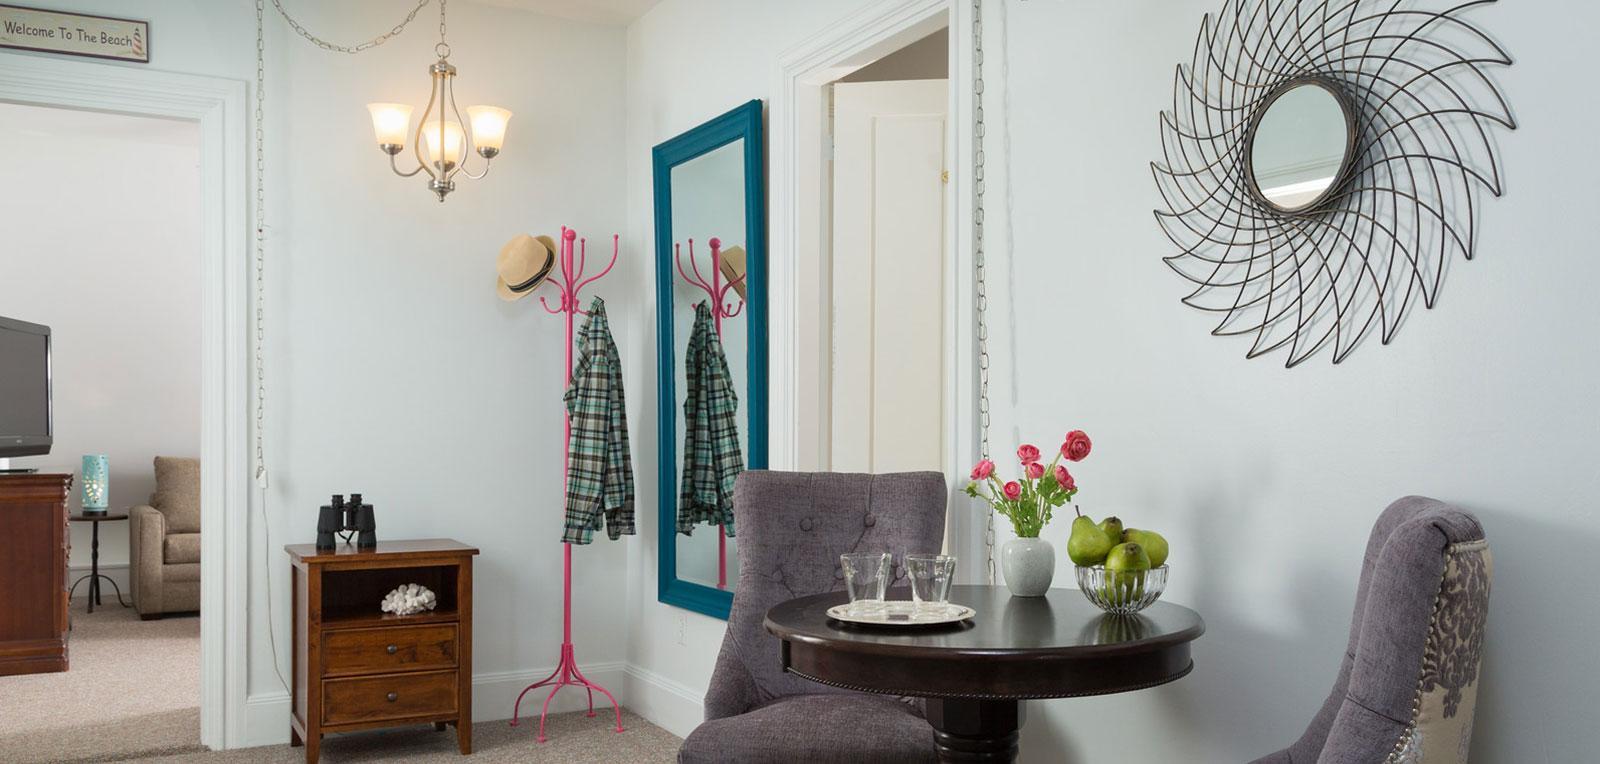 Admiral Sims' Suite Livingroom | ADMIRAL SIMS B&B, Newport Rhode Island